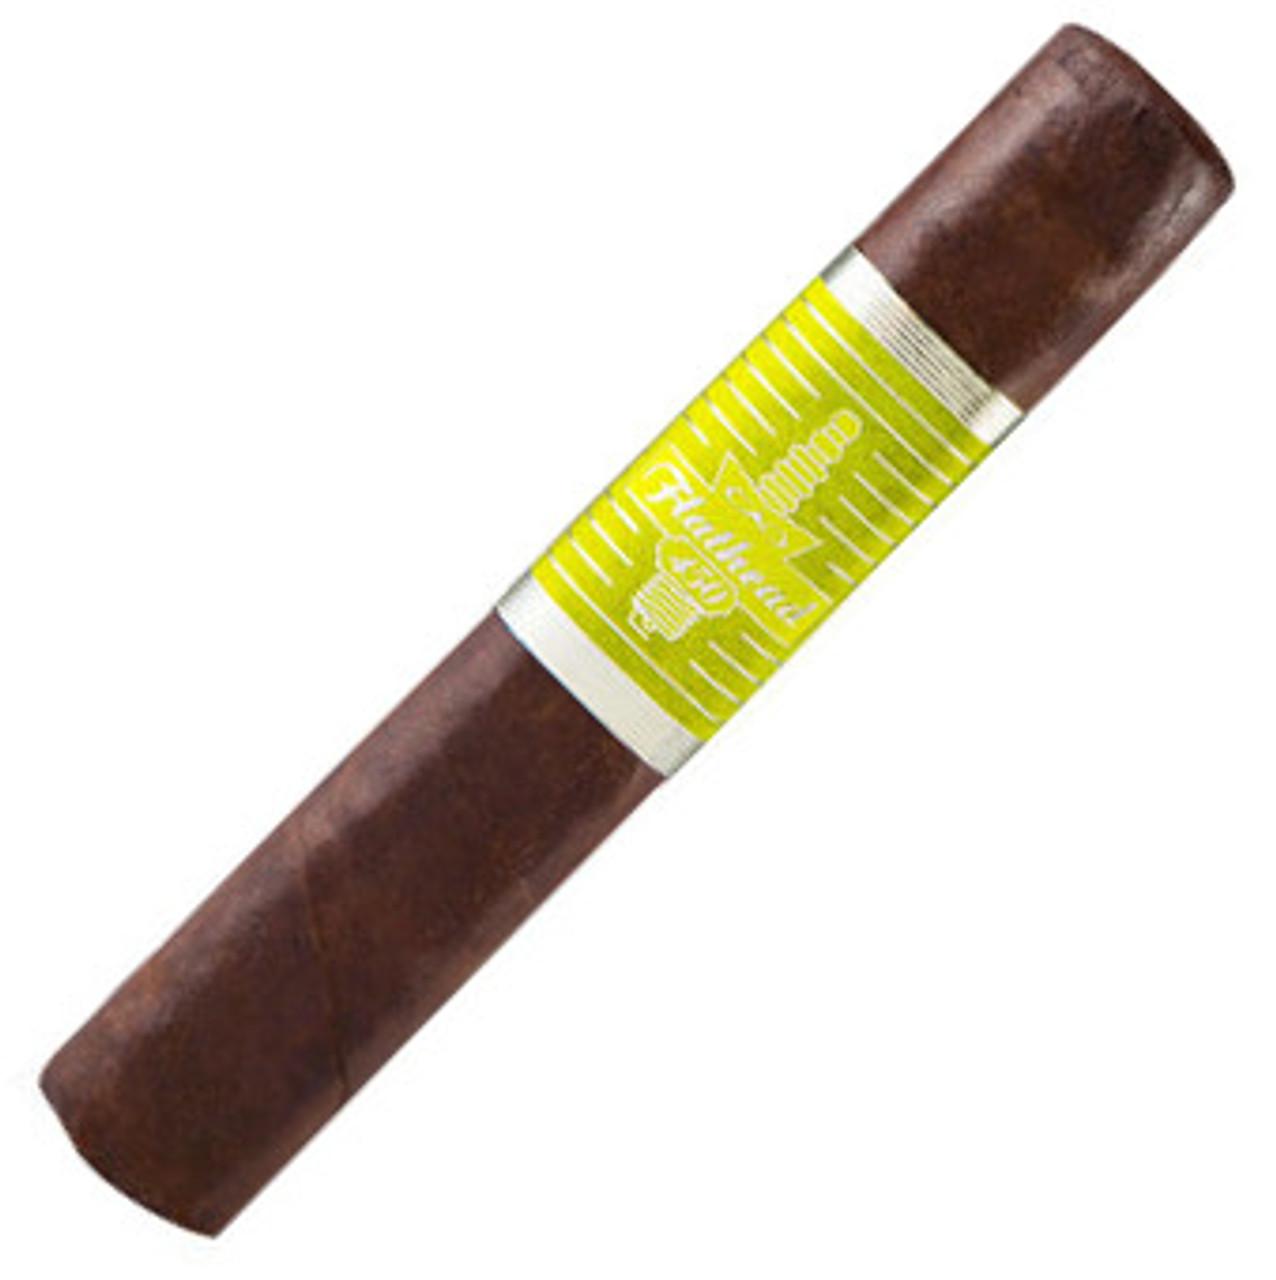 CAO Flathead Spark Plug Cigars - 4 1/2 x 50 (Box of 20)